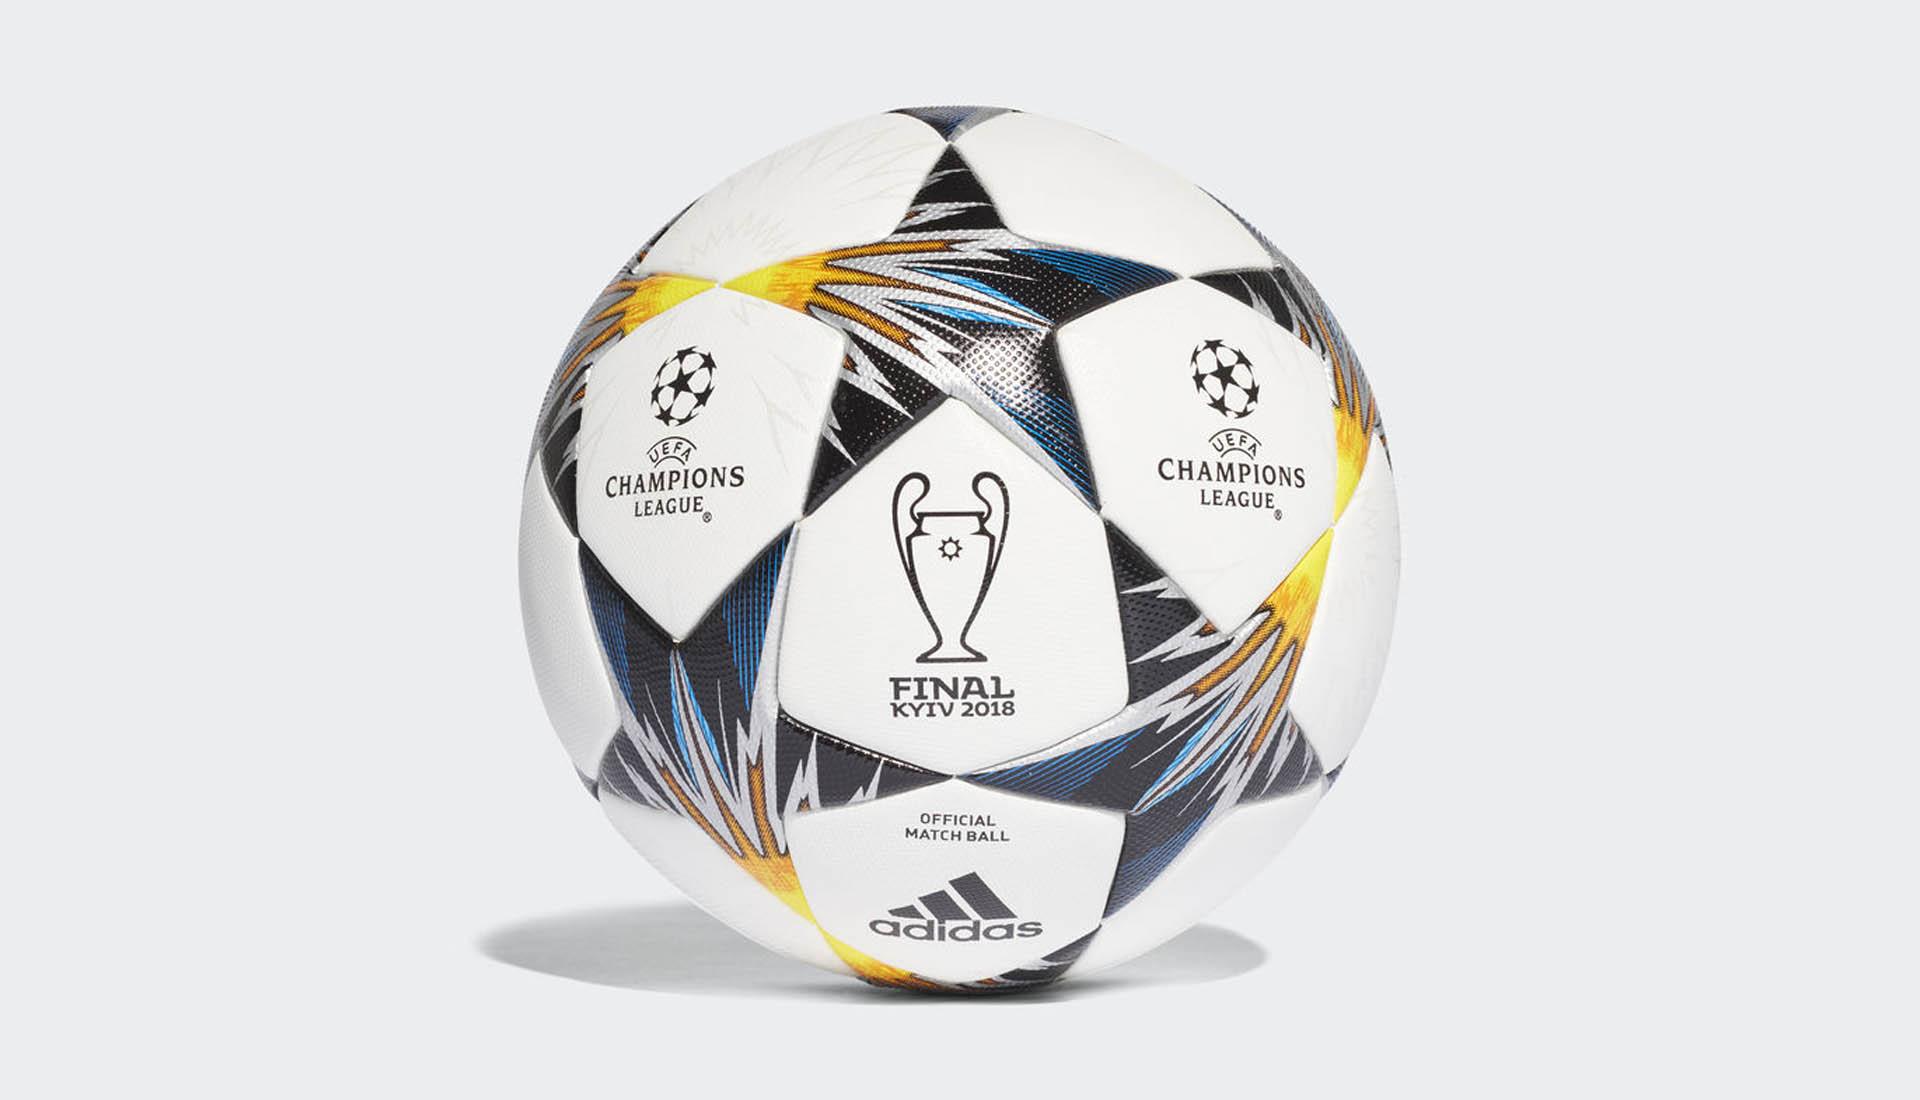 Adidas Unveil UEFA Champions League Ball at bethedifference World Final